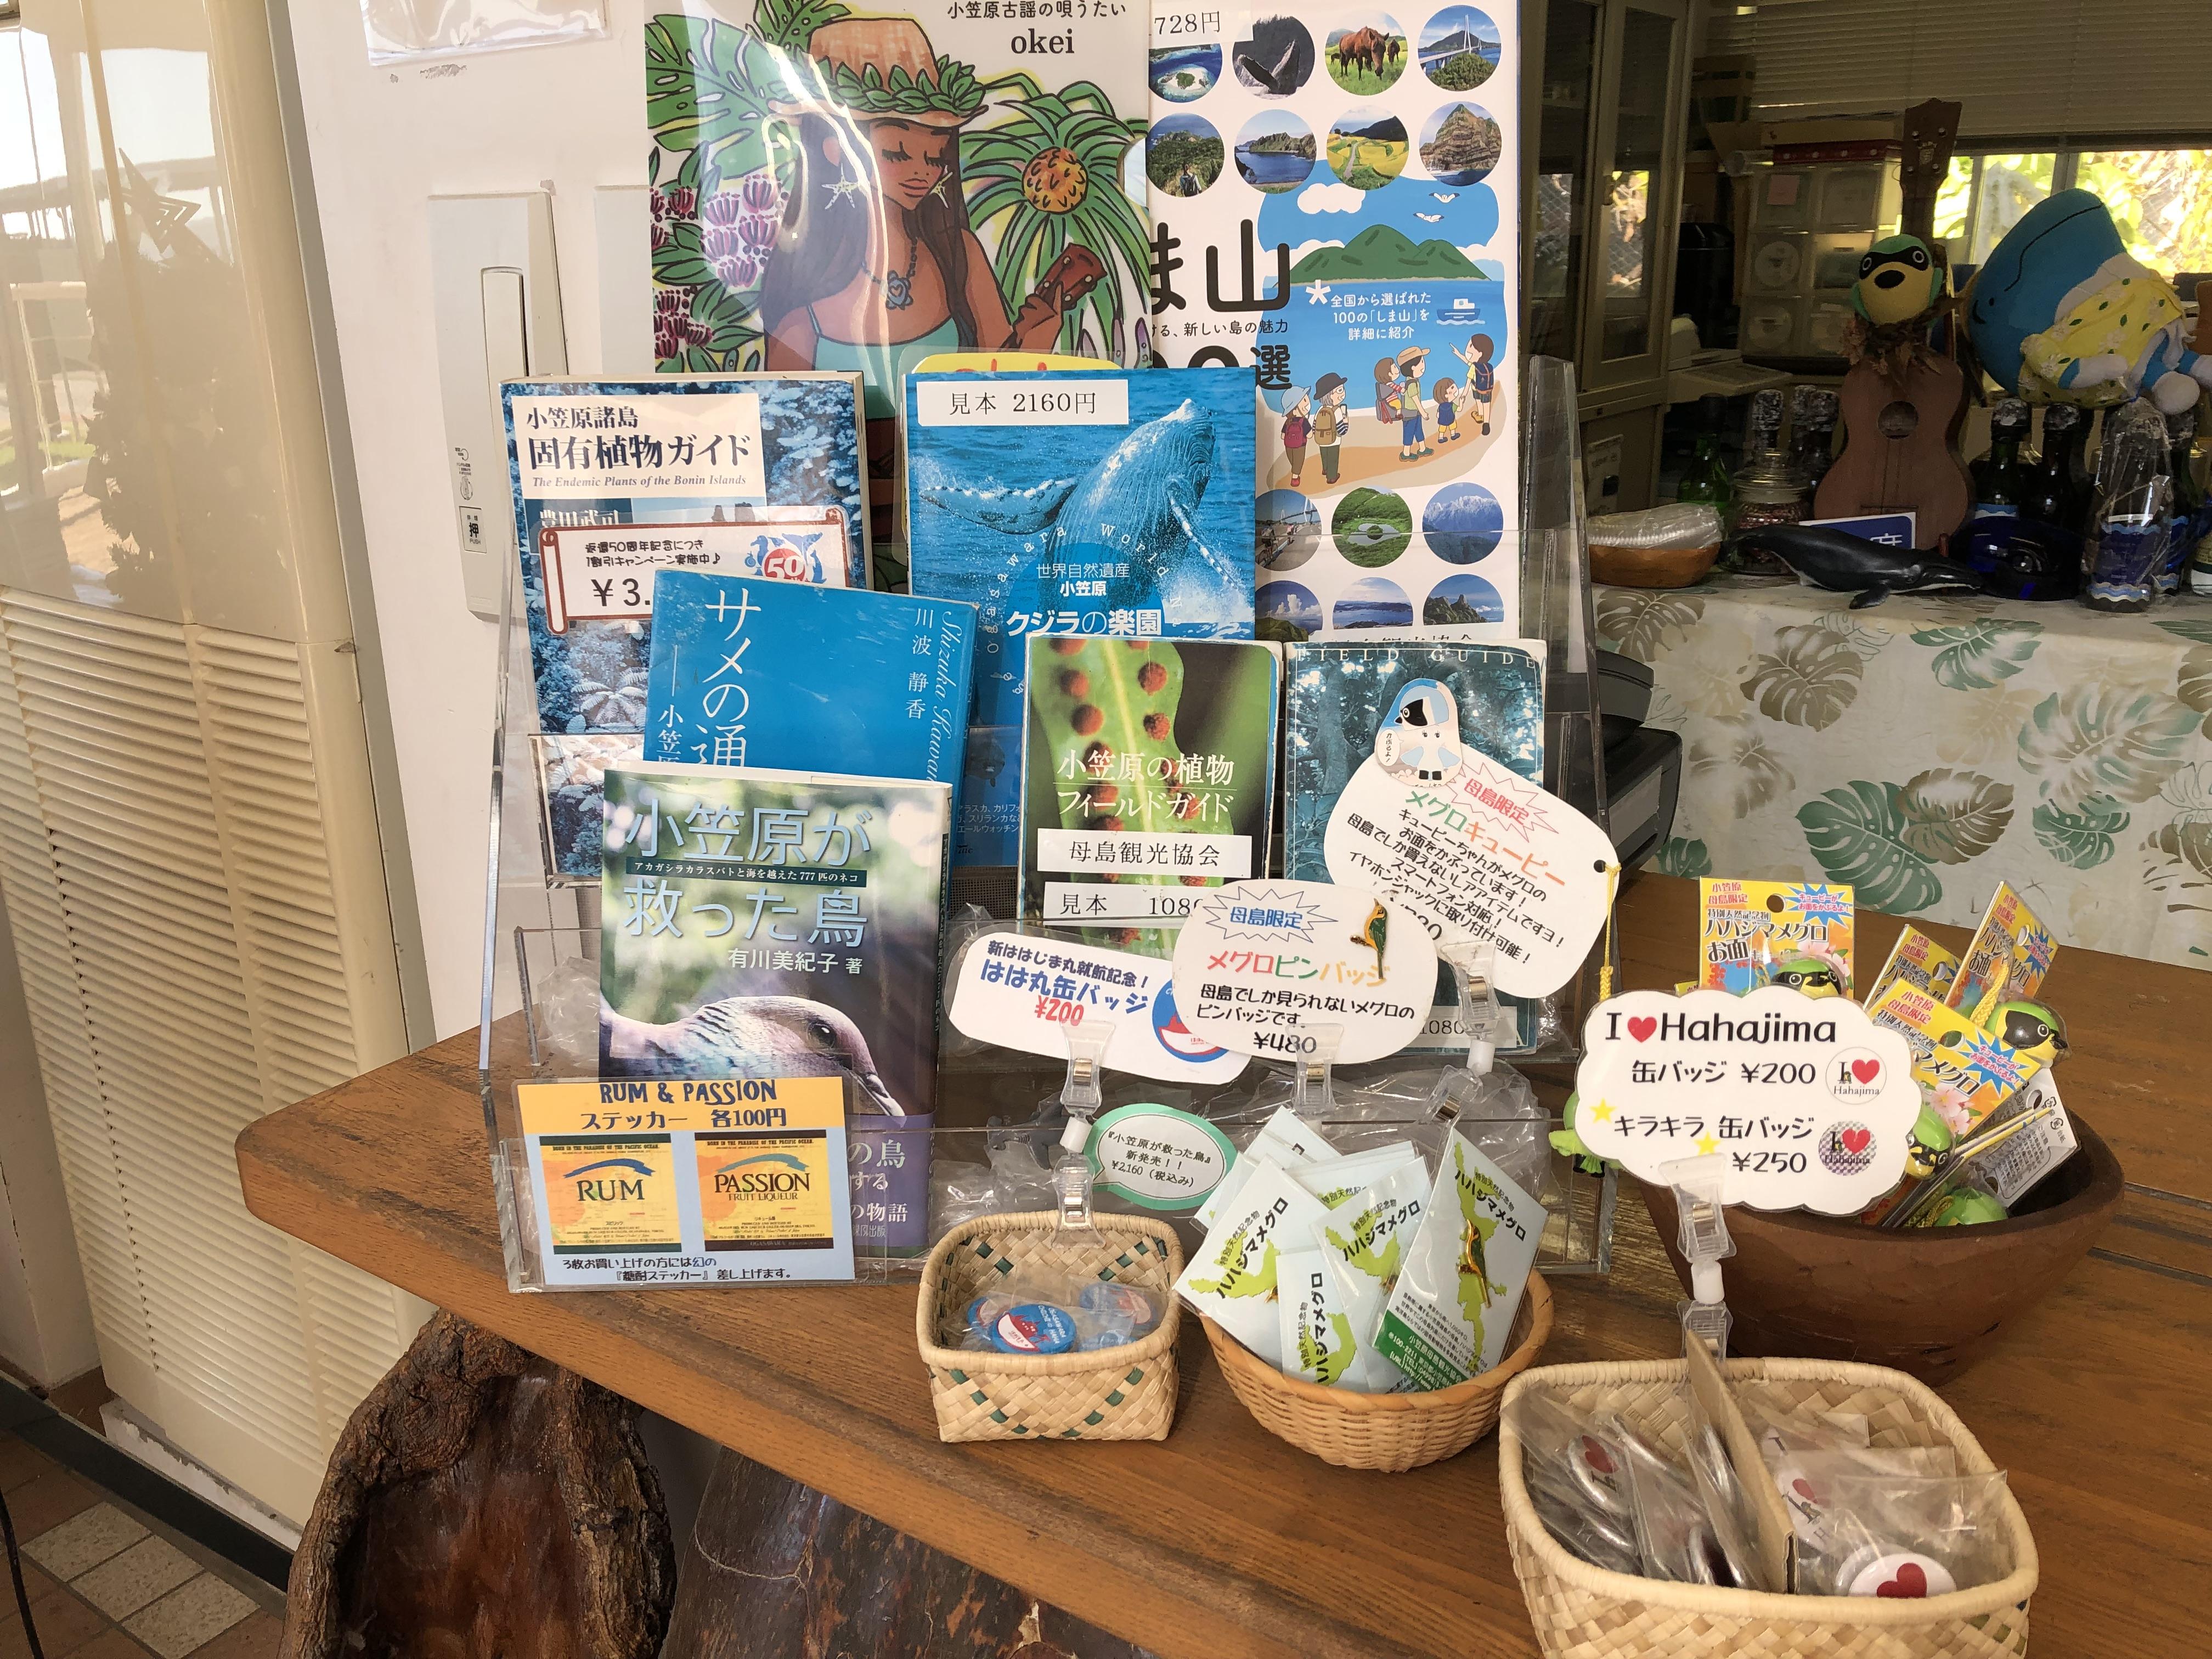 Hahajima Tourist Association